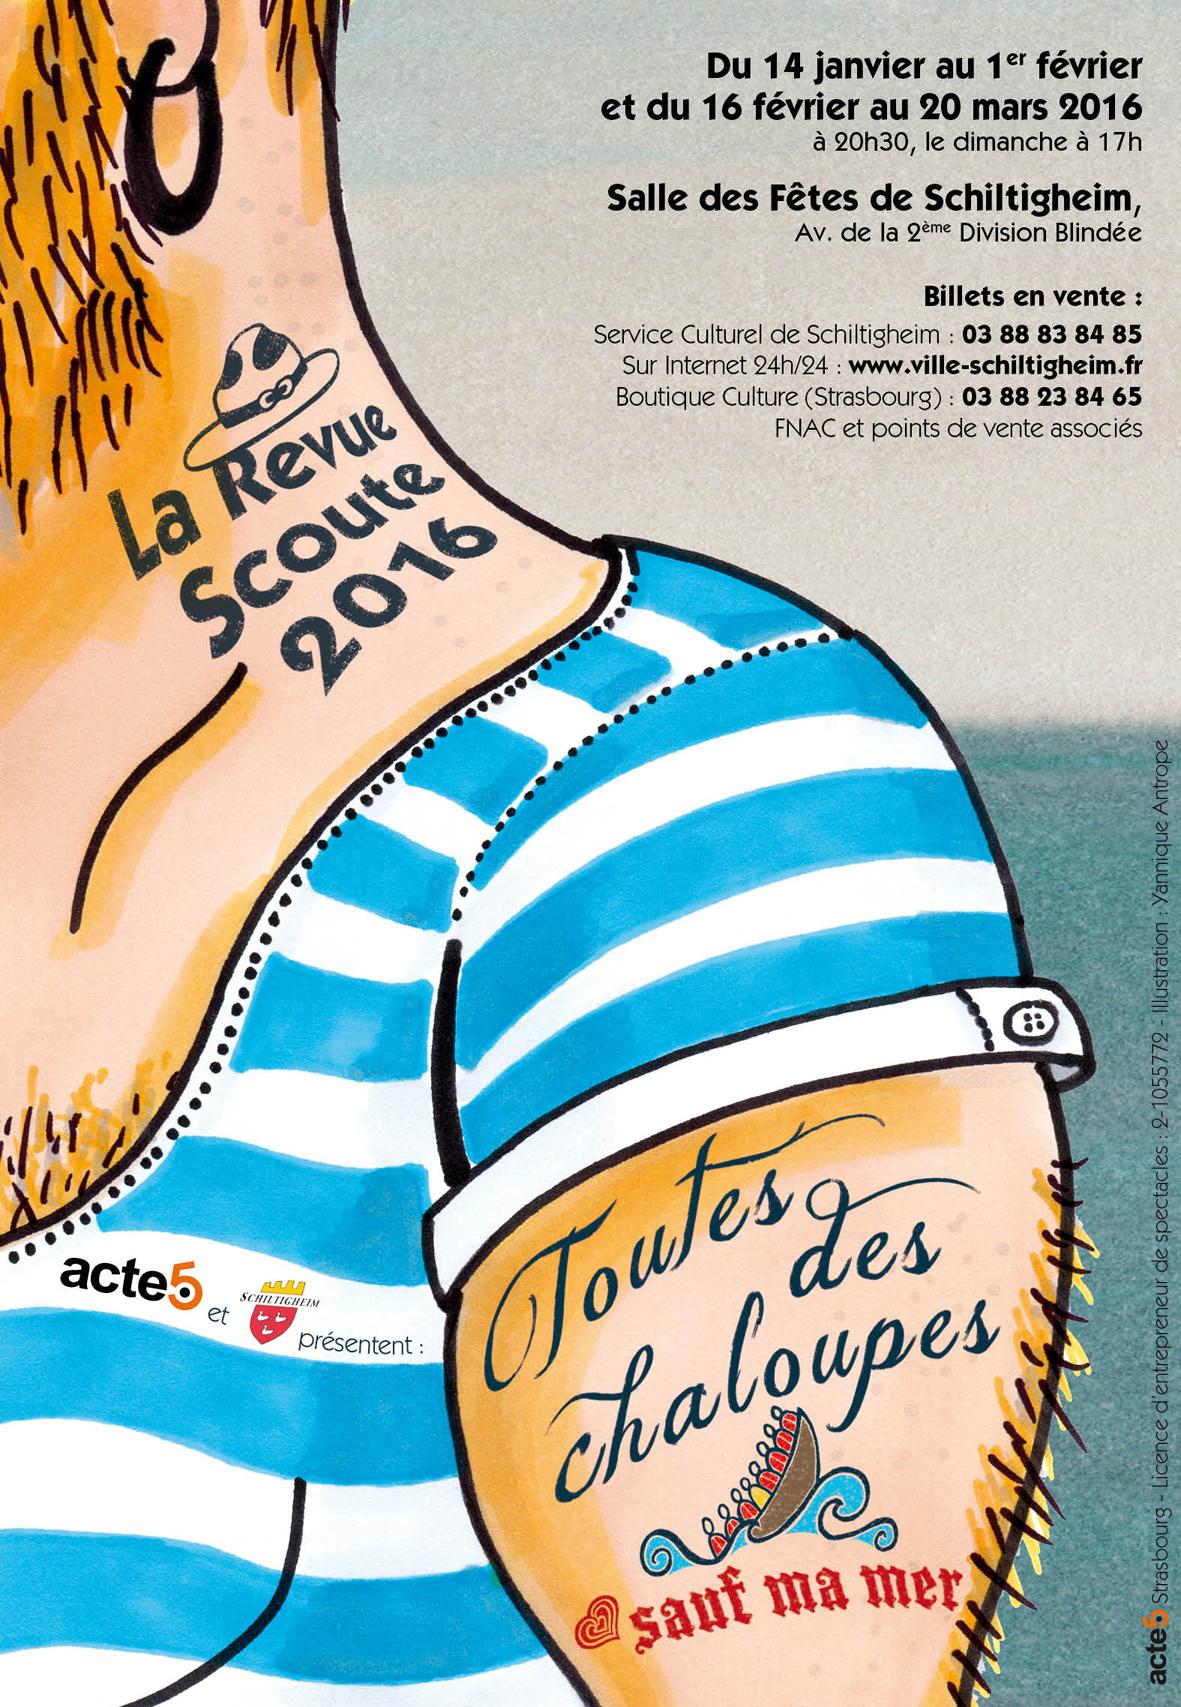 Affiche Revue Scoute 2016